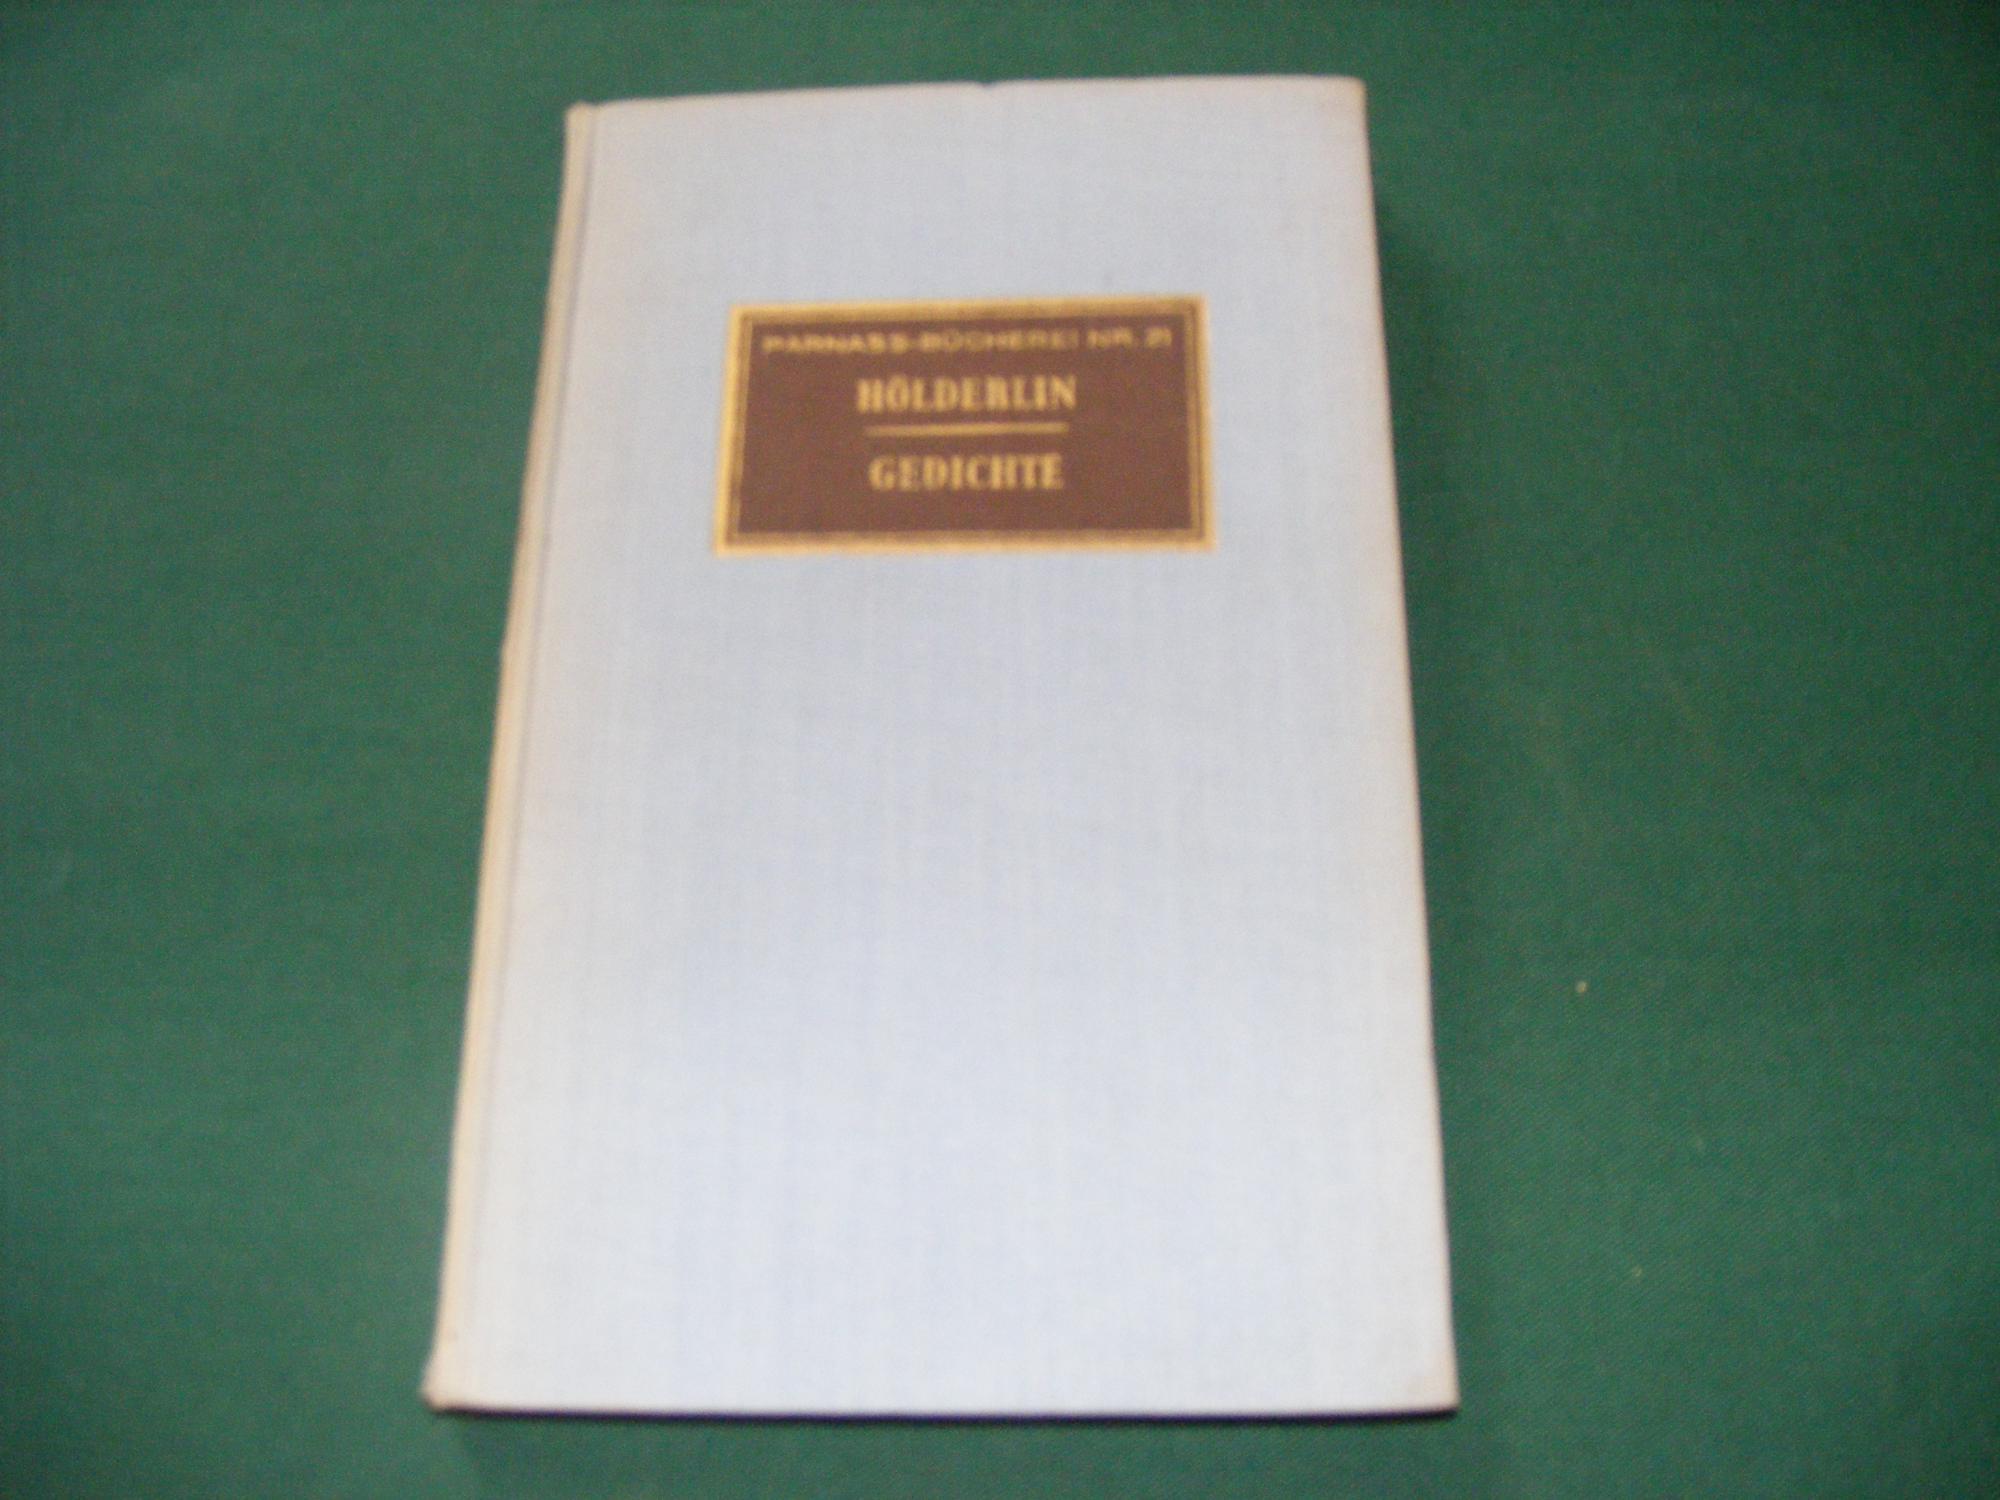 GEDICHTE Parnass Bücherei Nr. 21: HOLDERLIN Friedrich